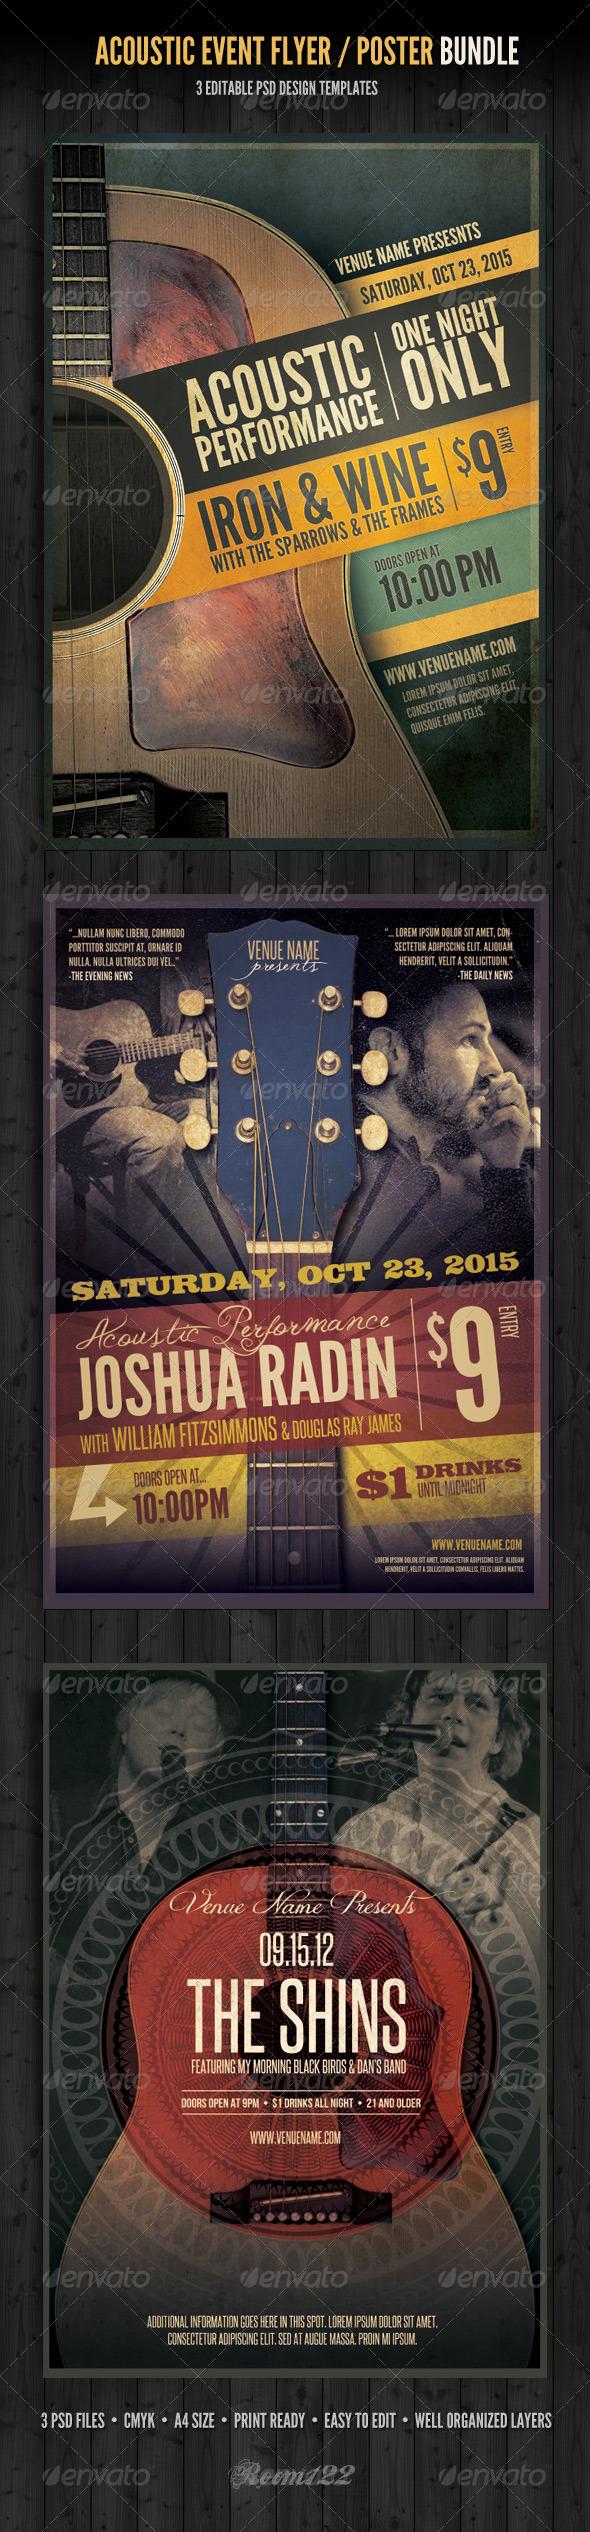 Acoustic Event Flyer/Poster Template Bundle - Concerts Events